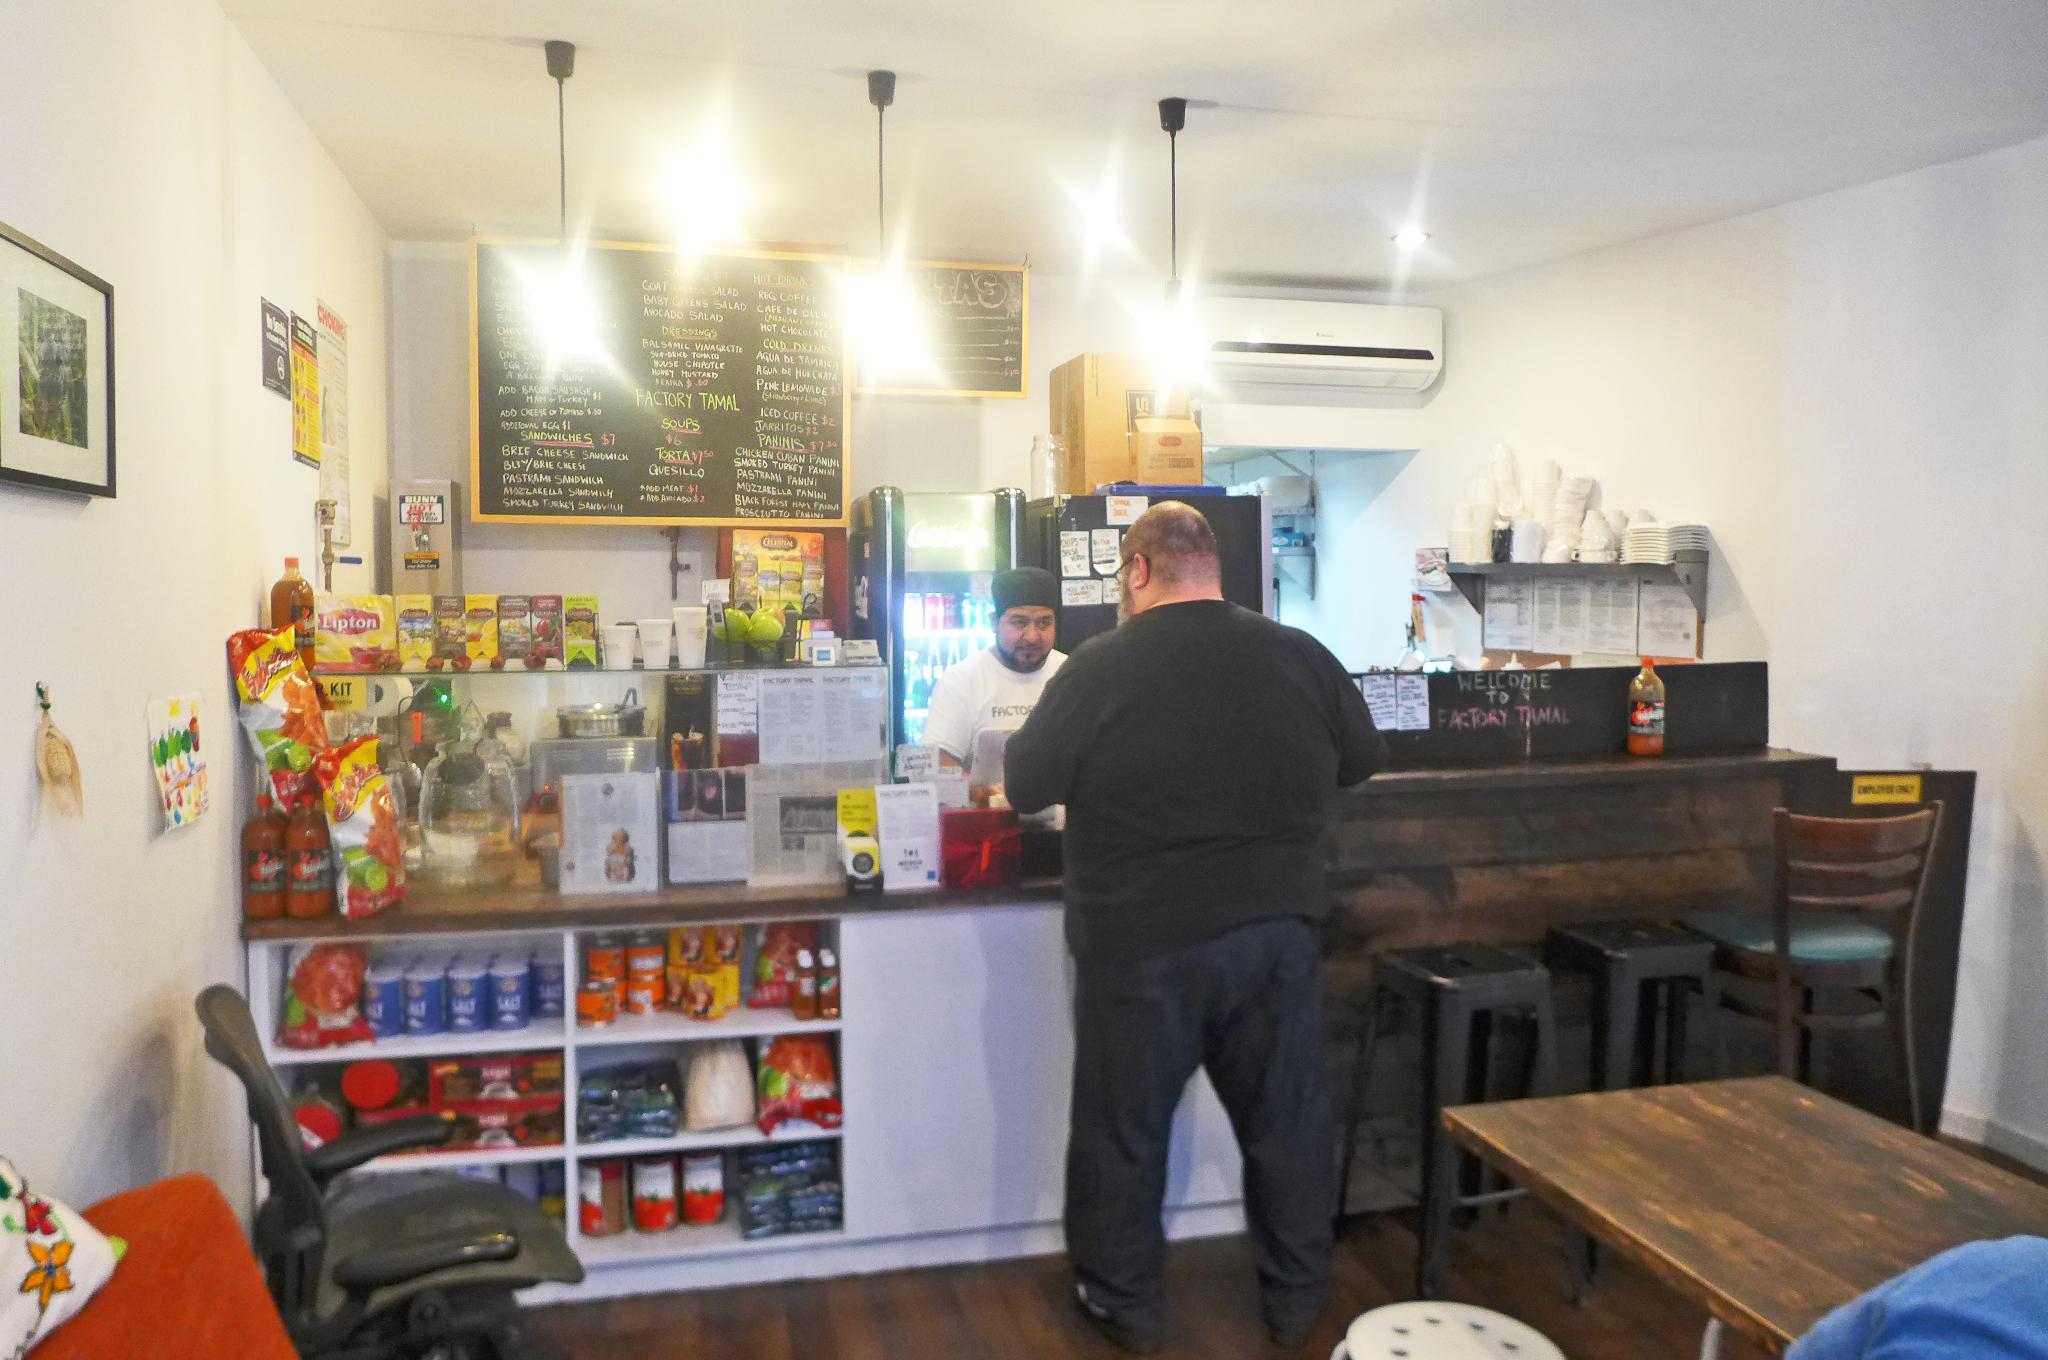 Robert Sietsema's Best Restaurants of 2019 So Far